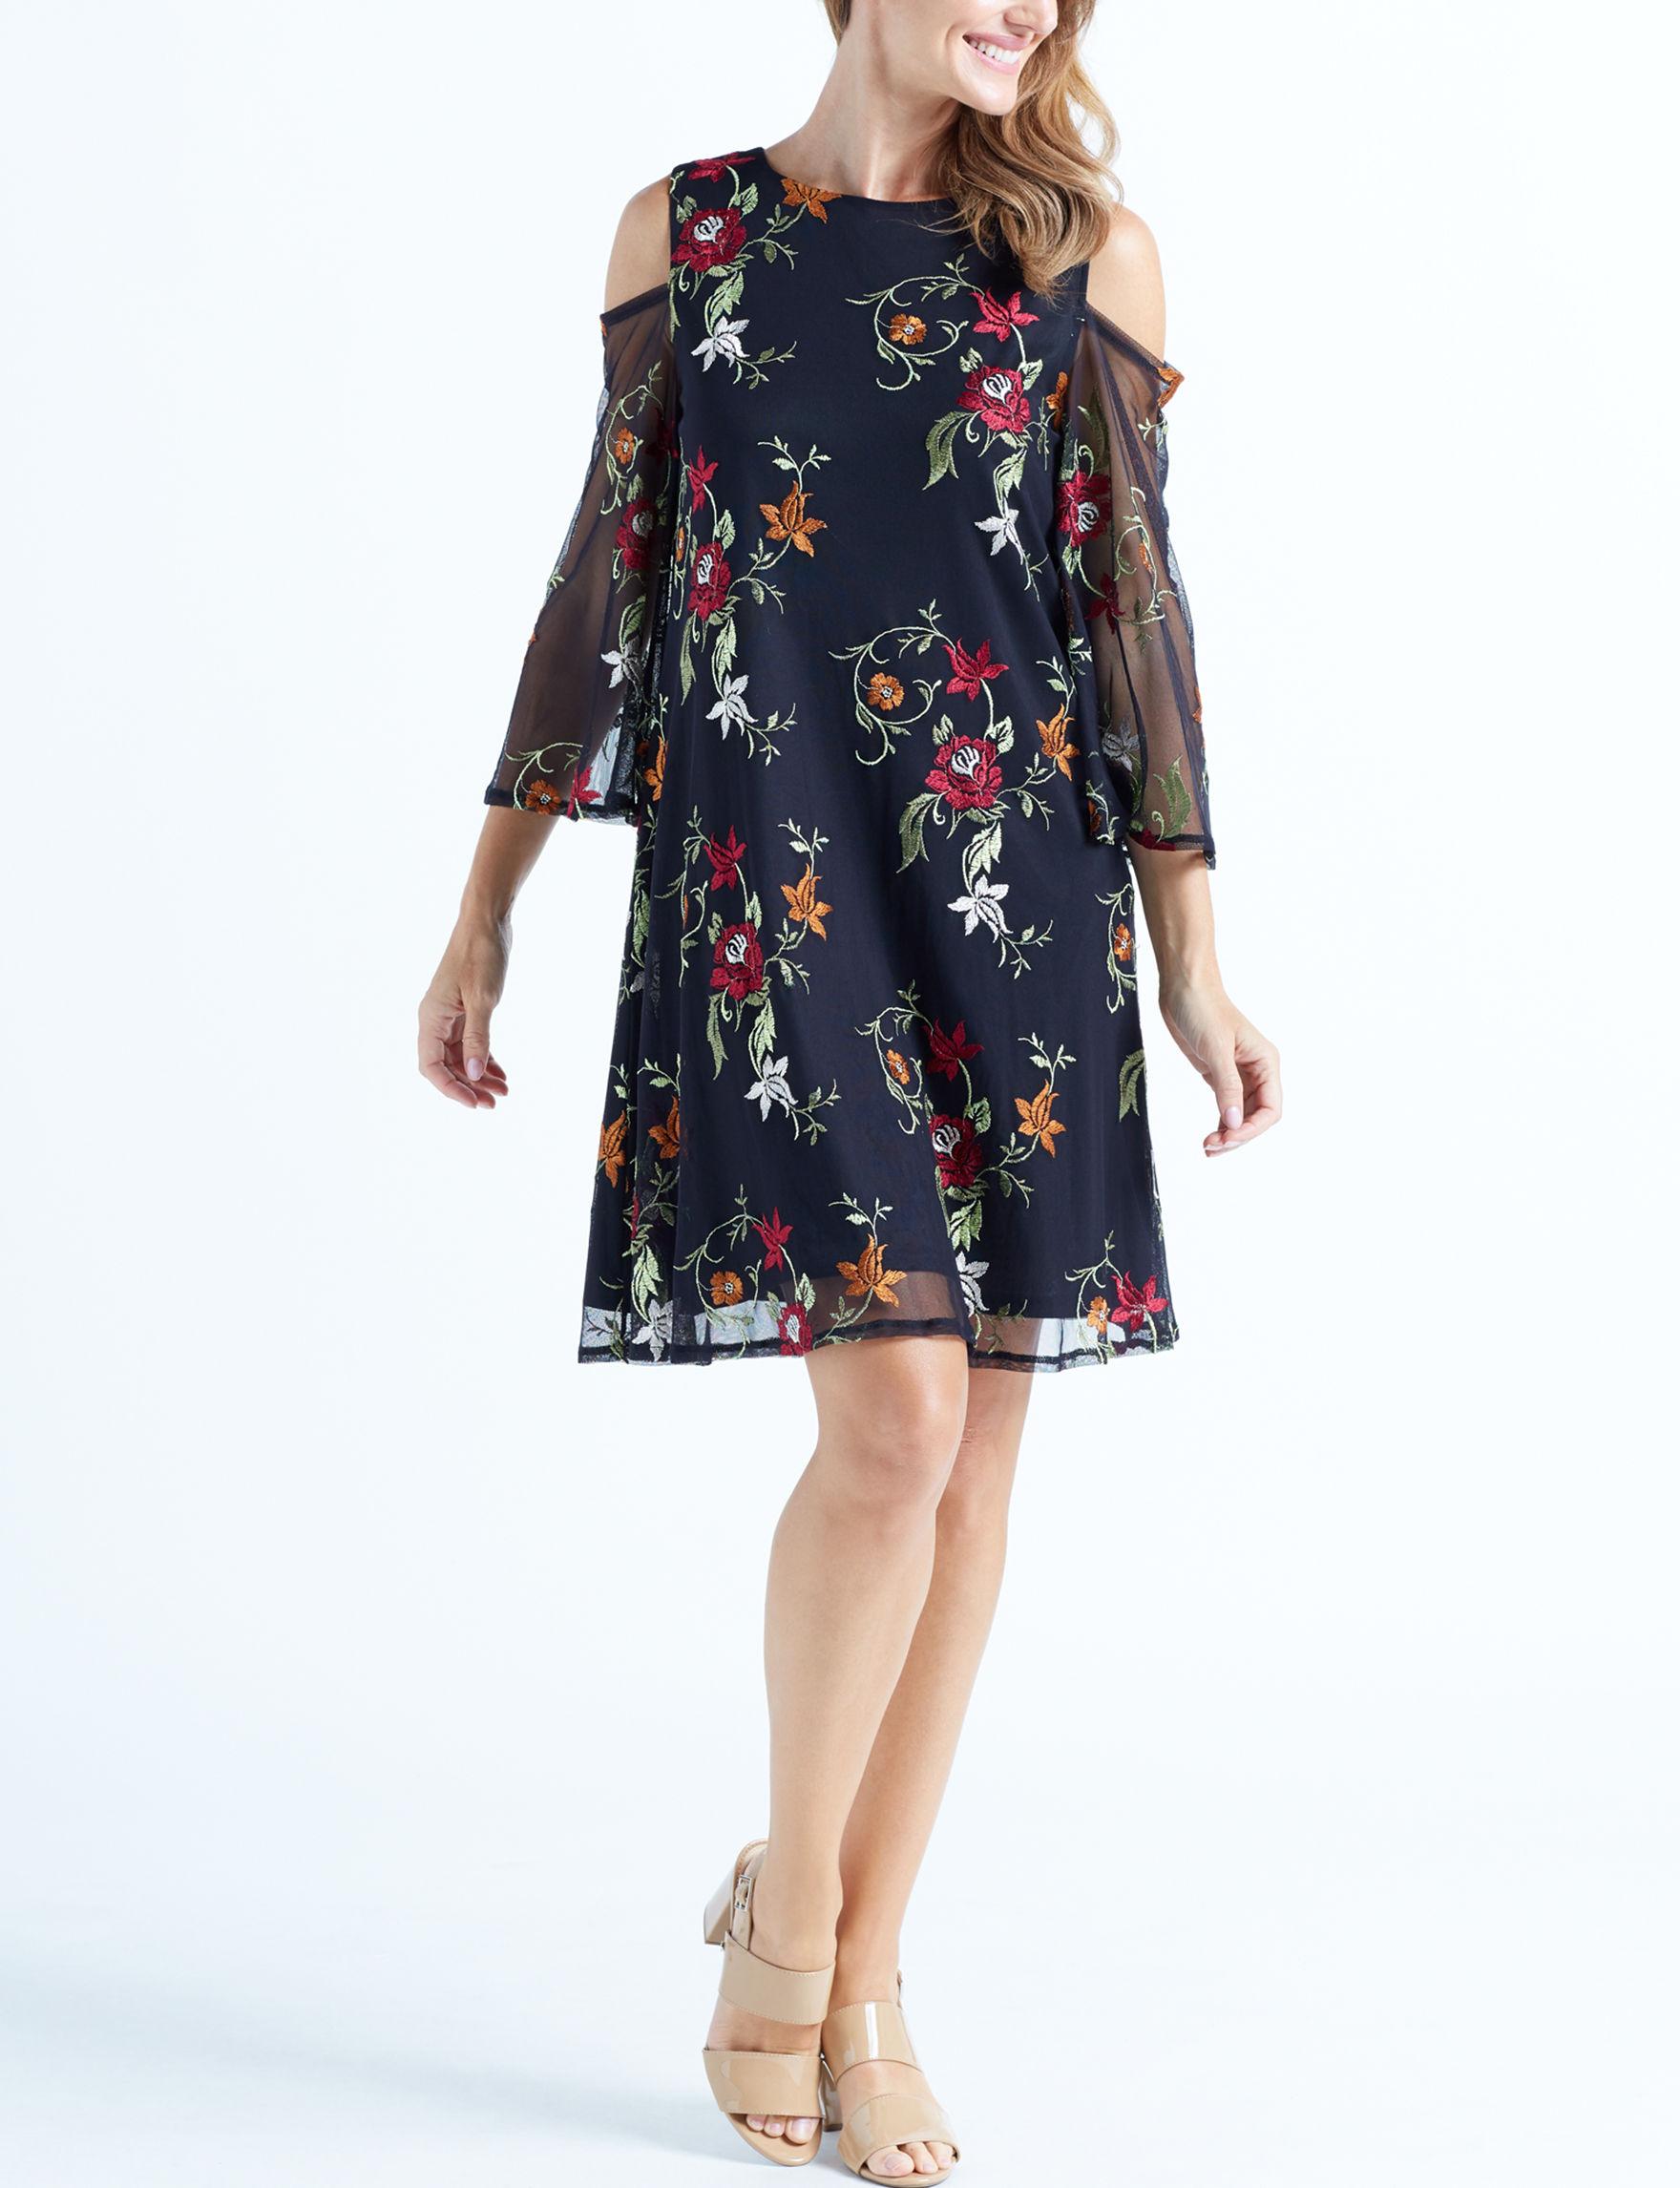 Nina Leonard Black Everyday & Casual Shift Dresses